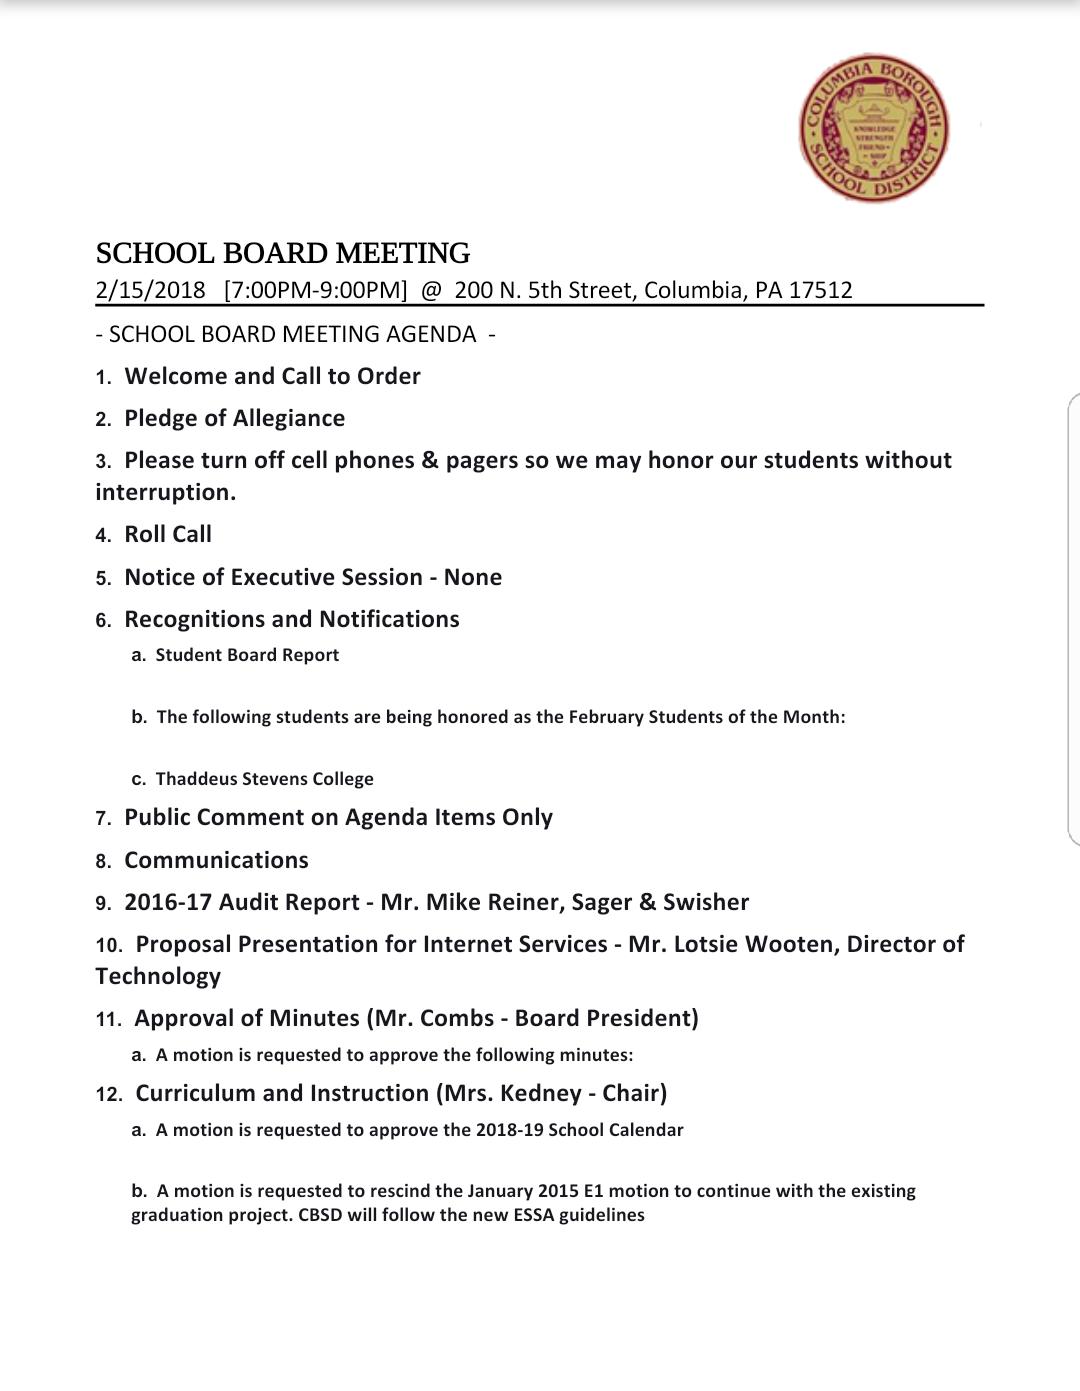 COLUMBIA SPY: Draft Agenda - School Board Meeting Feb. 15, 2018